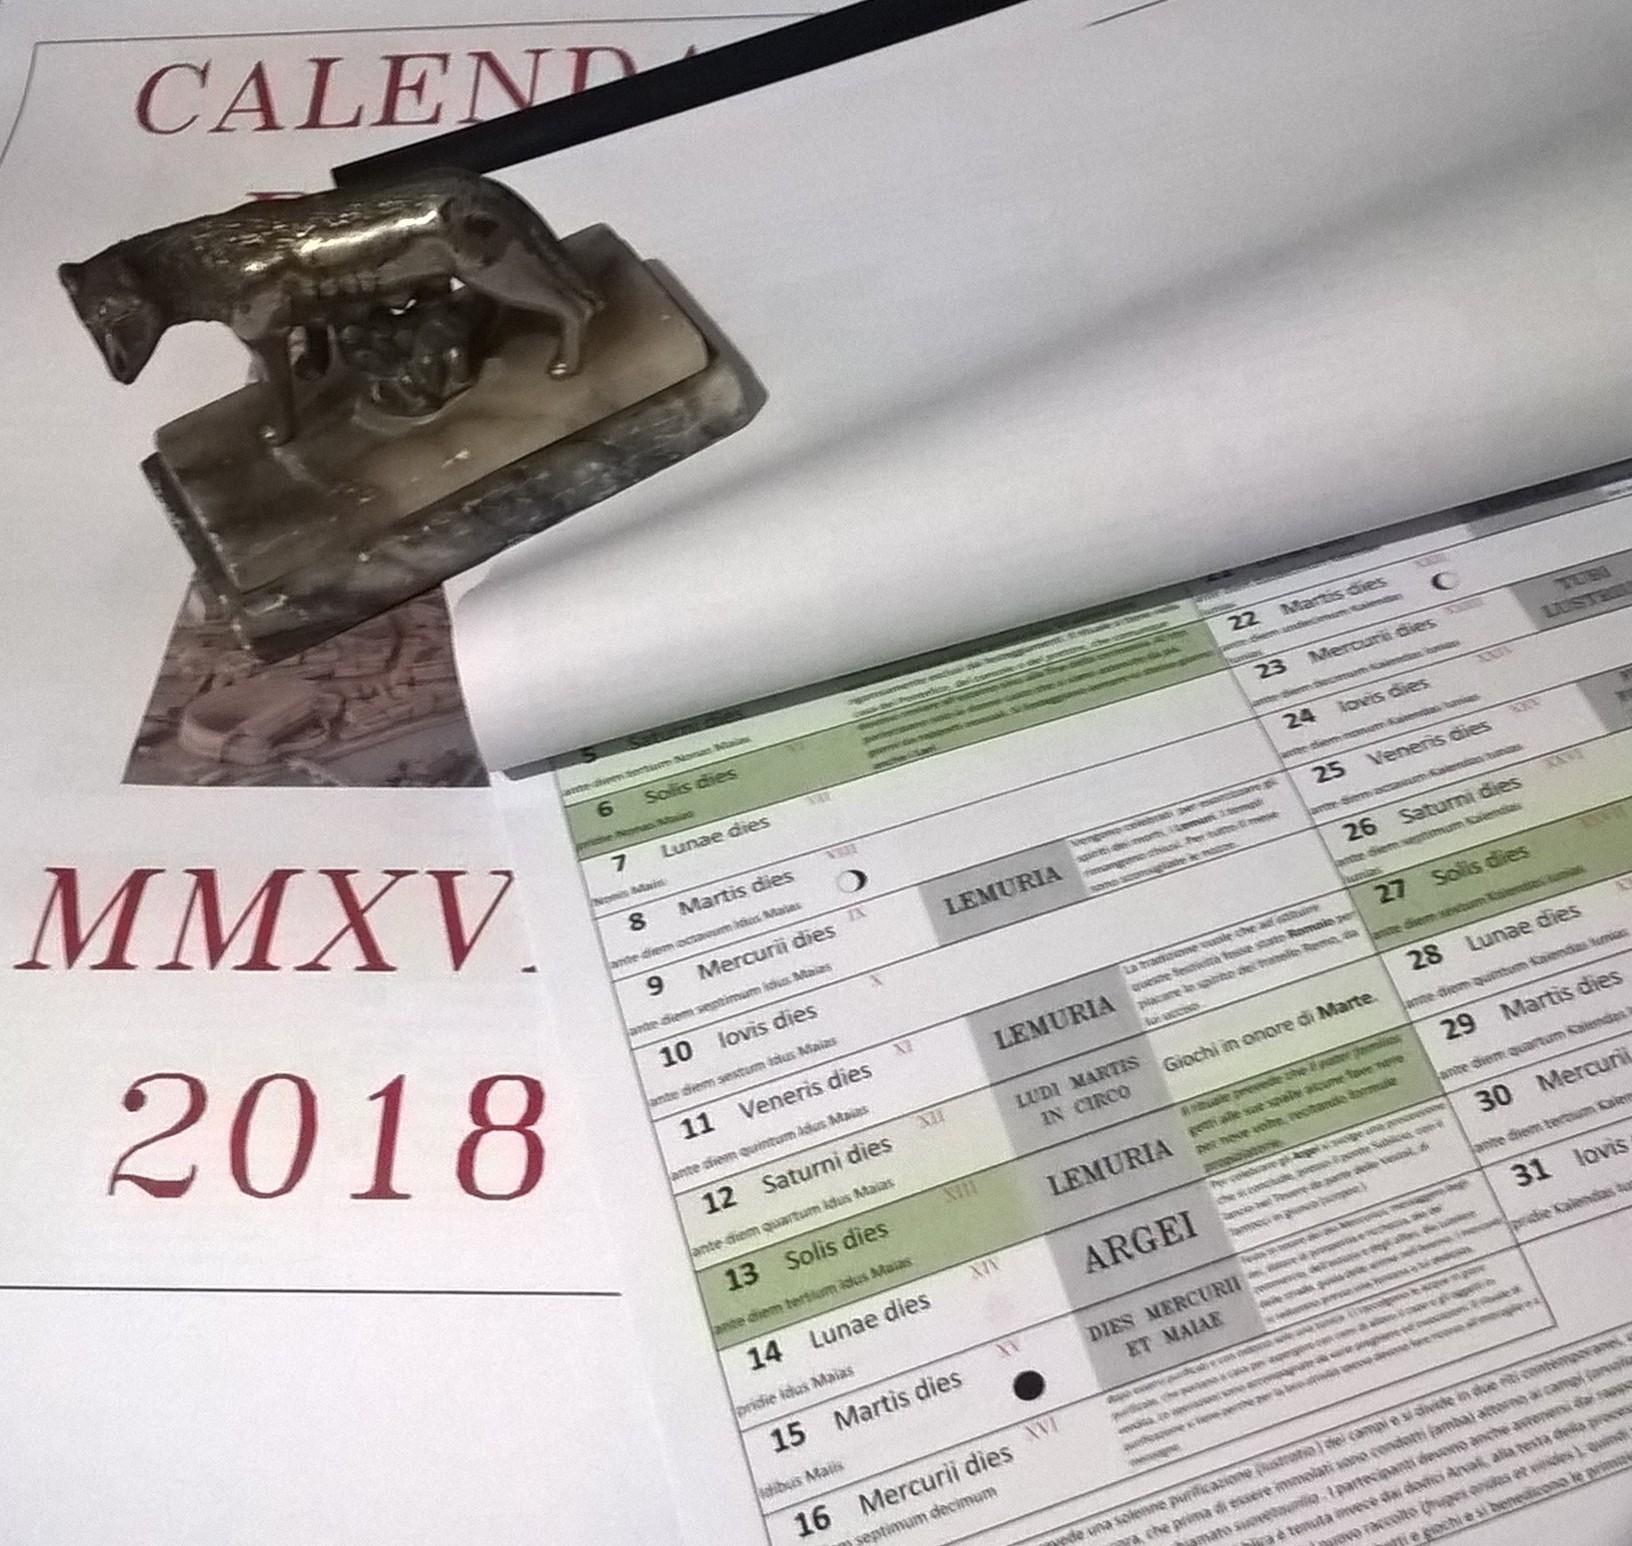 Calendario Romano MMXVIII (2018)